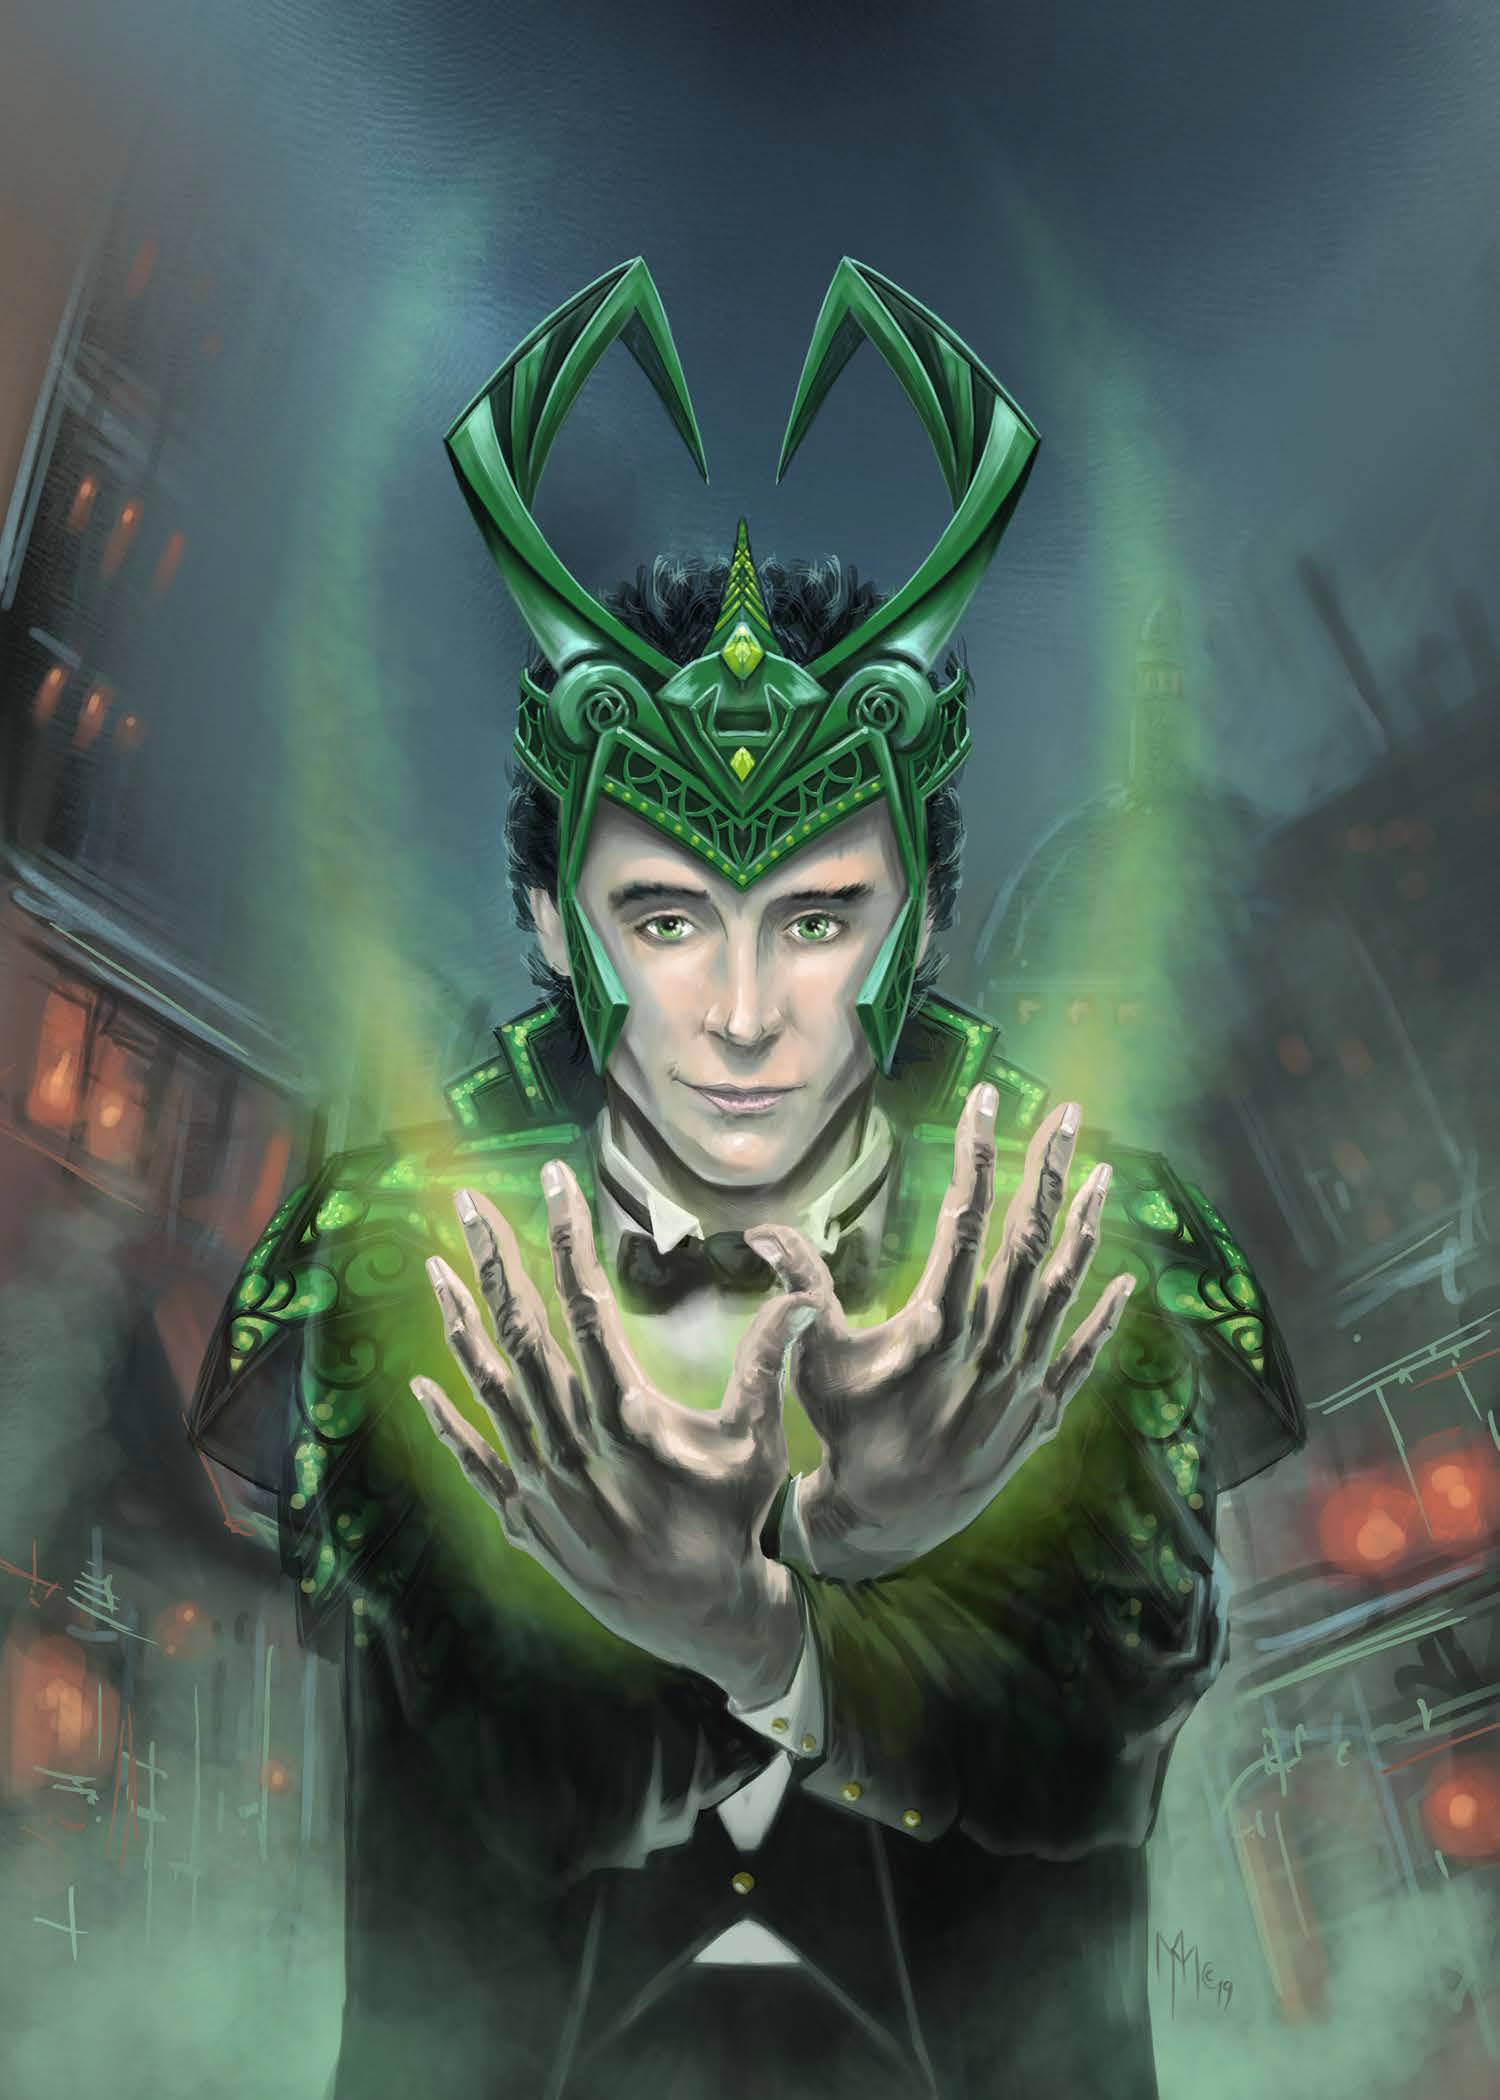 Loki revealing himself as the God of mischief. Illustration from Loki of Midgard.